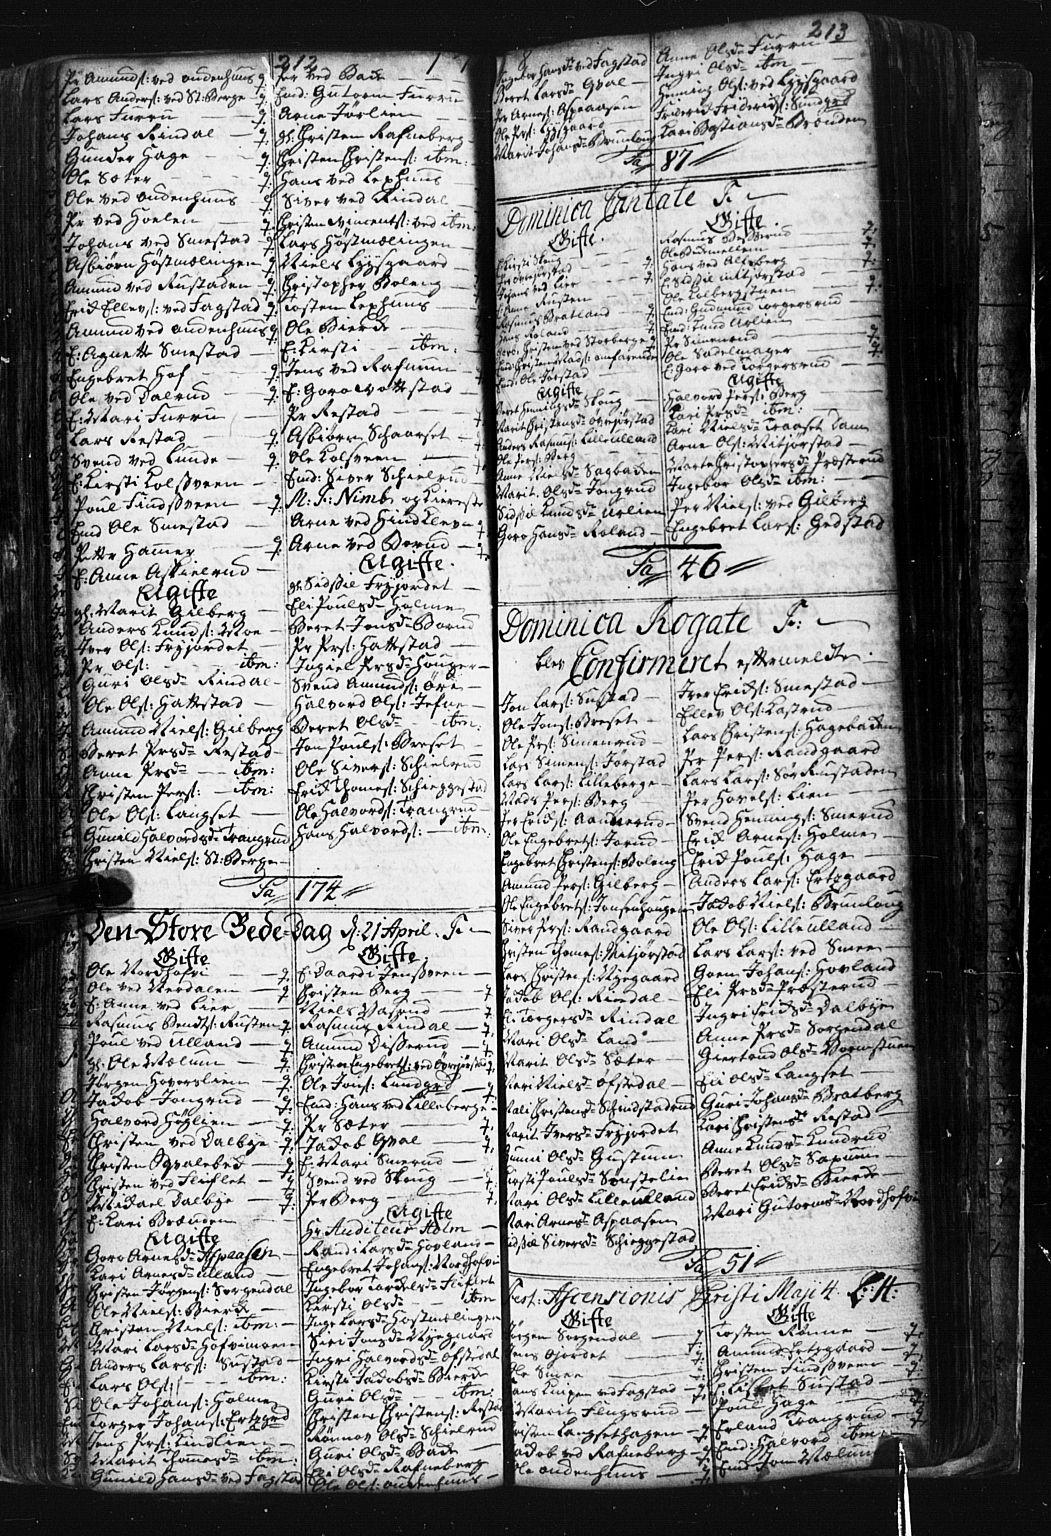 SAH, Fåberg prestekontor, Klokkerbok nr. 1, 1727-1767, s. 212-213